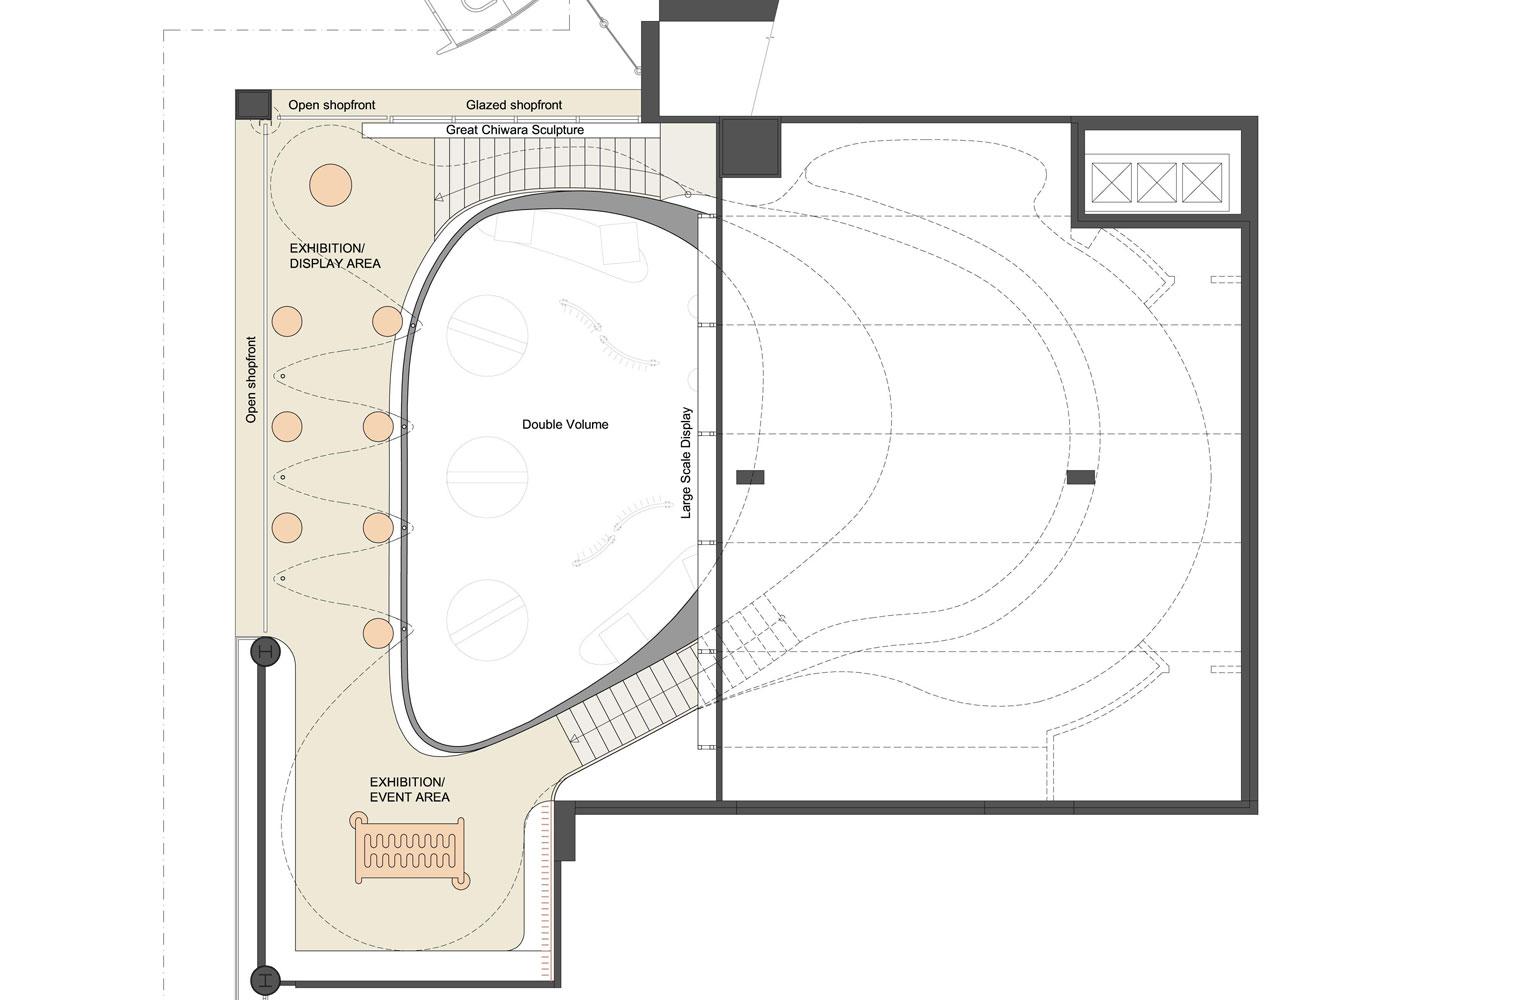 Bambara - OR Tambo, Mezzanine Plan